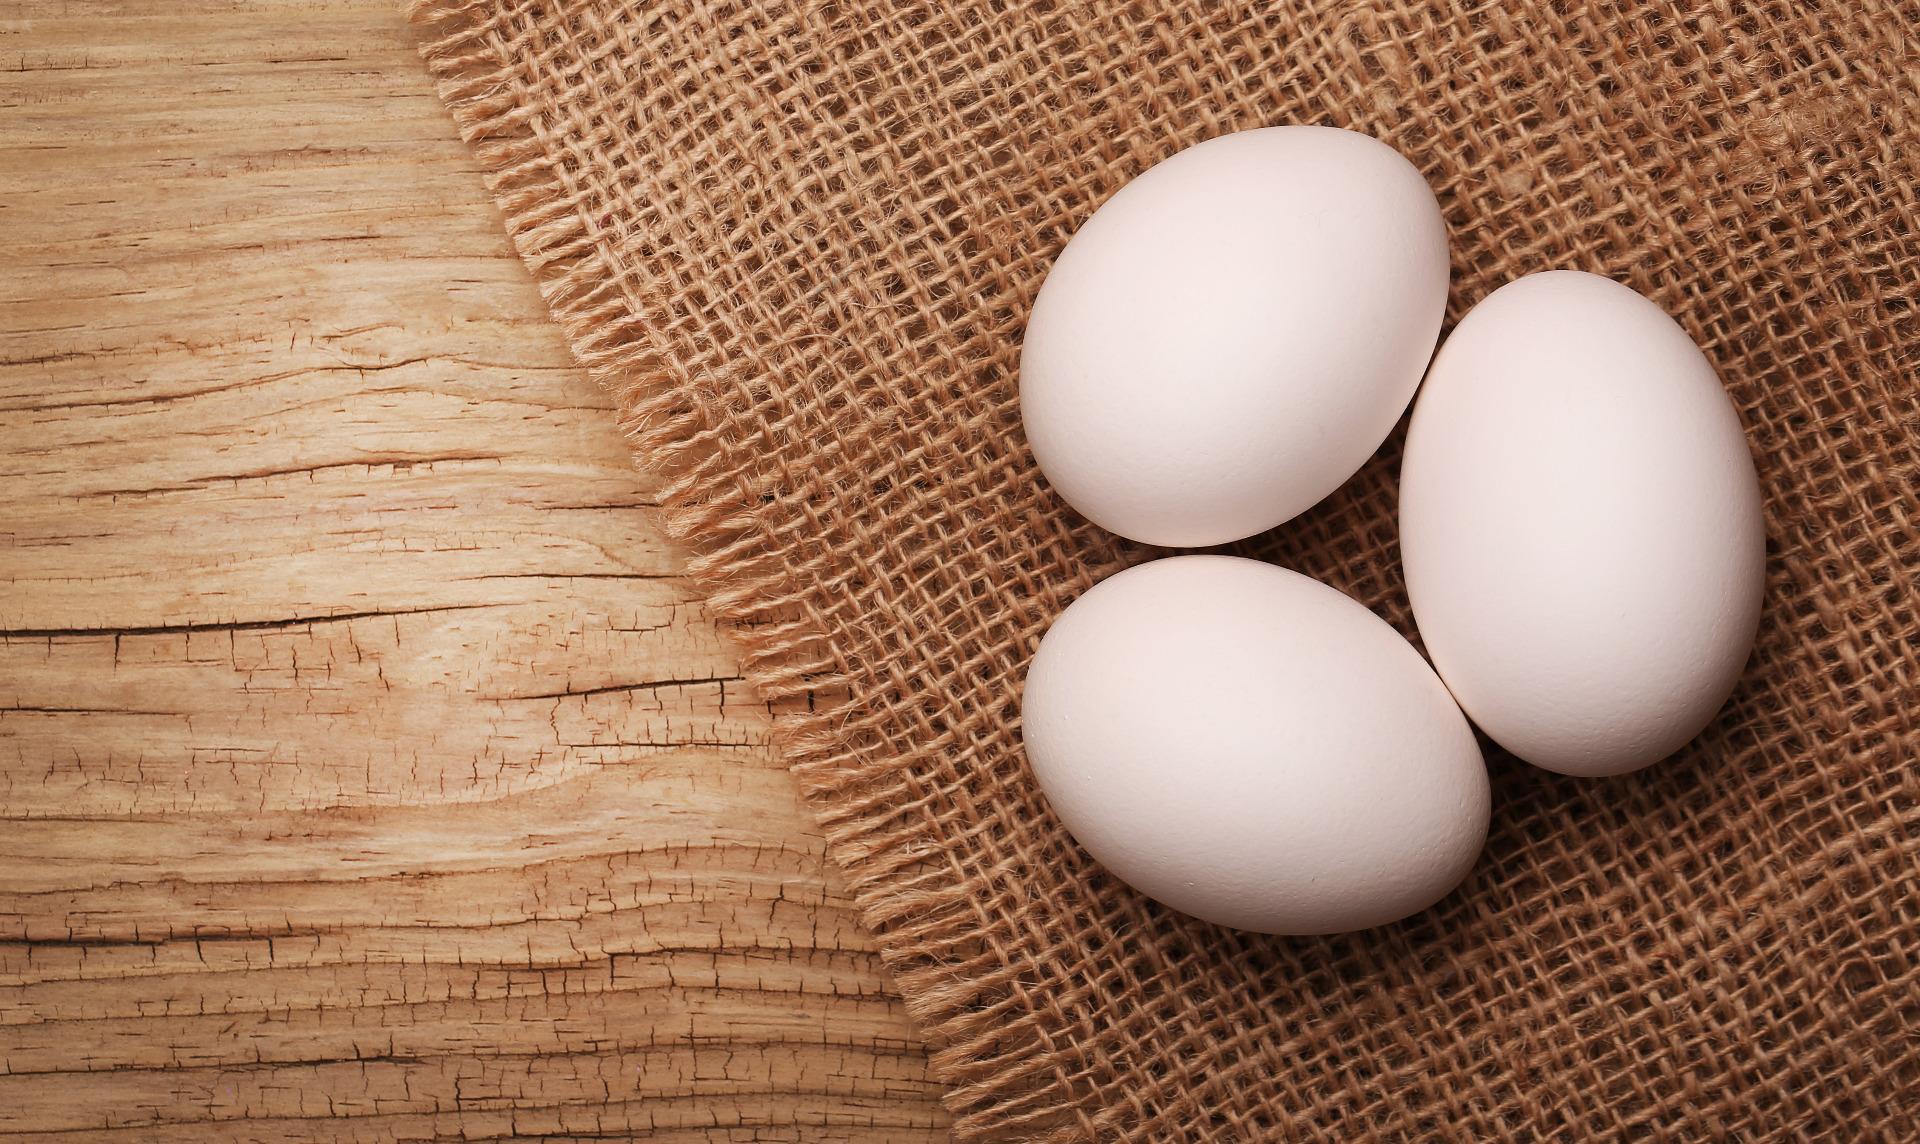 Uova fresche e genuine